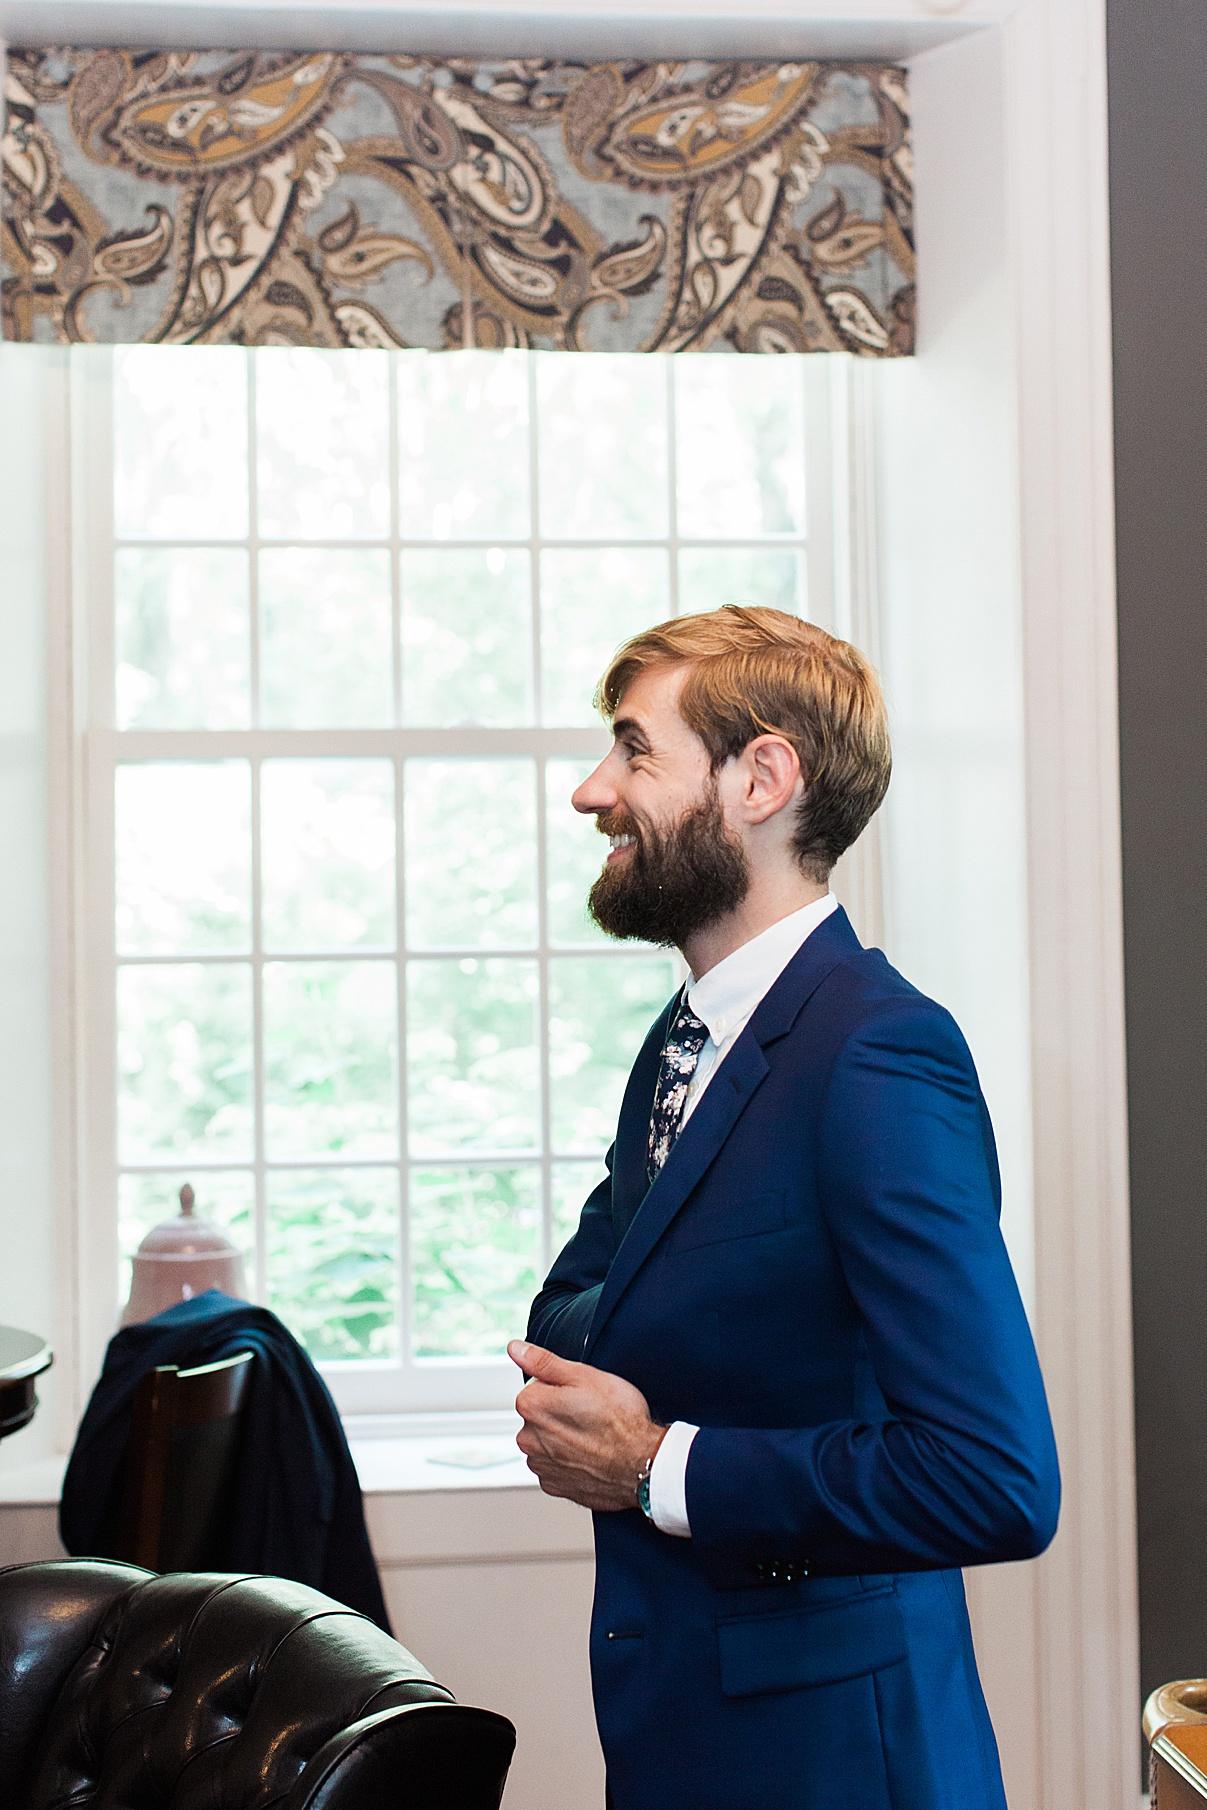 Groom grinning while getting ready | Balls Falls, Ontario Wedding| Ontario Wedding Photographer| Toronto Wedding Photographer| 3Photography|3photography.ca